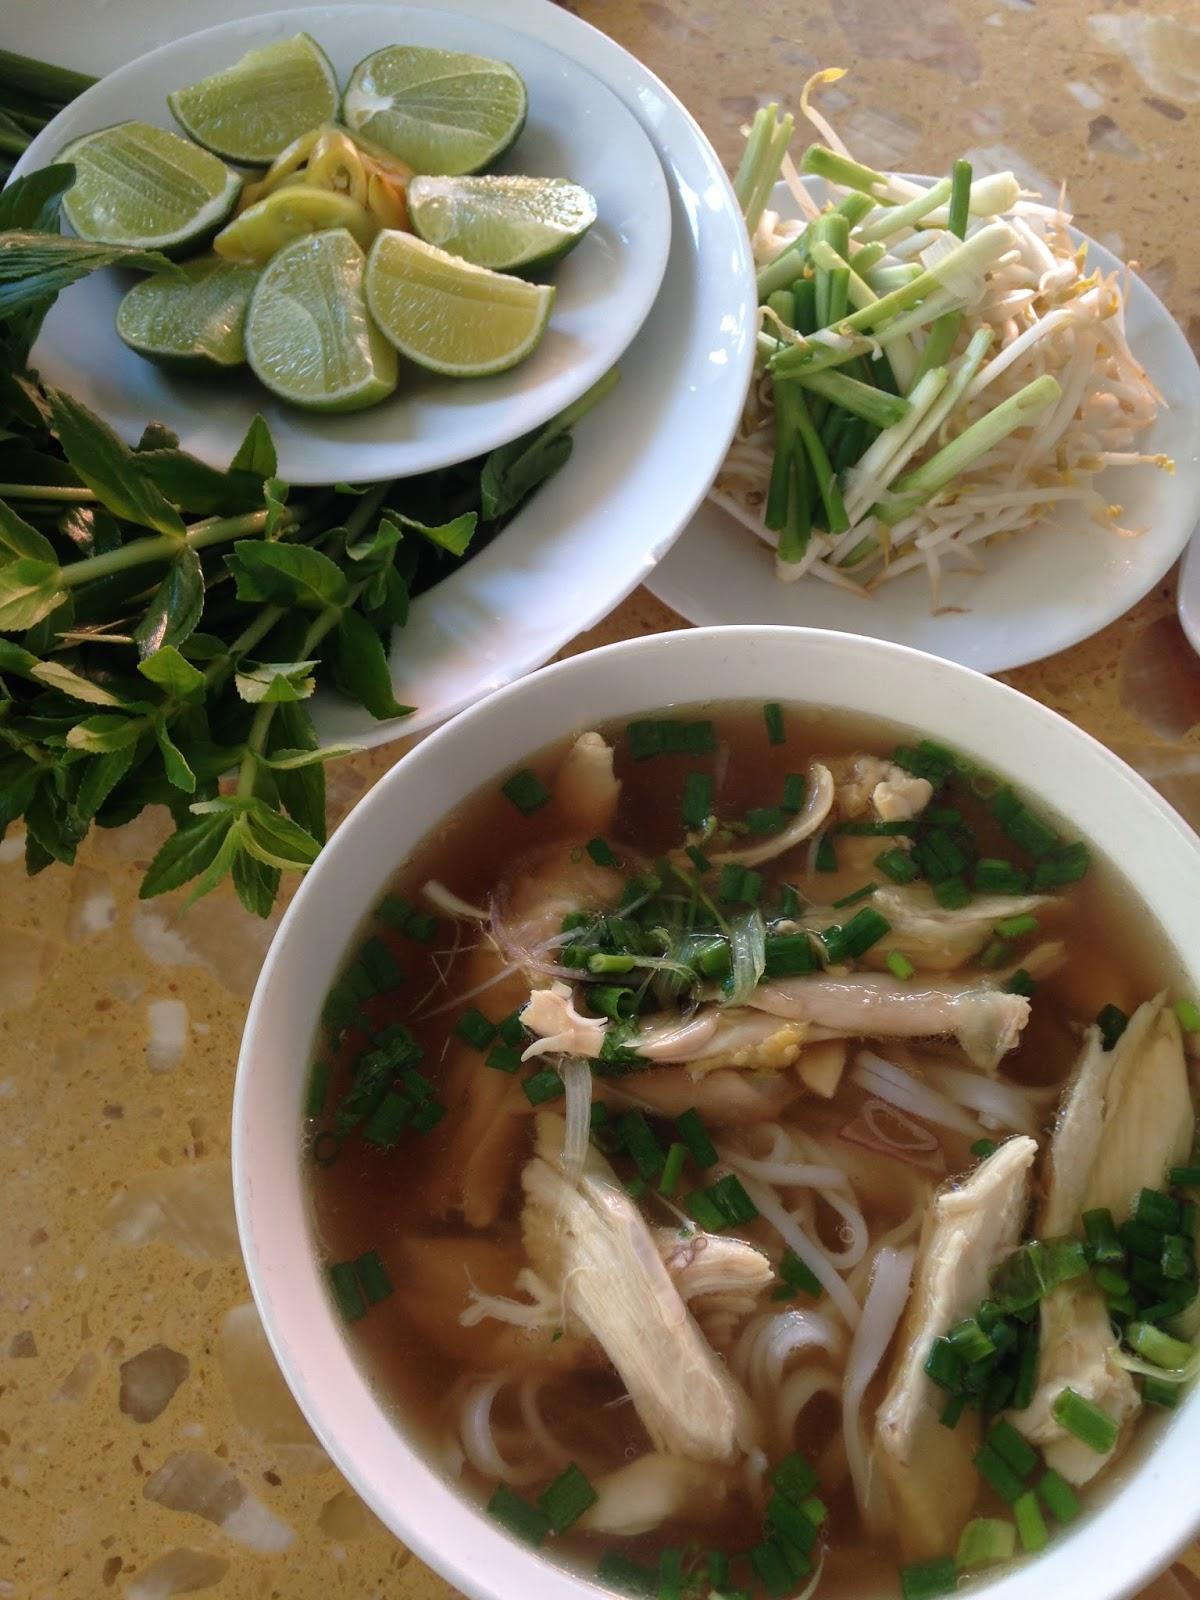 #ProjectMVietnam | Ho Chi Minh - The Wong Blog